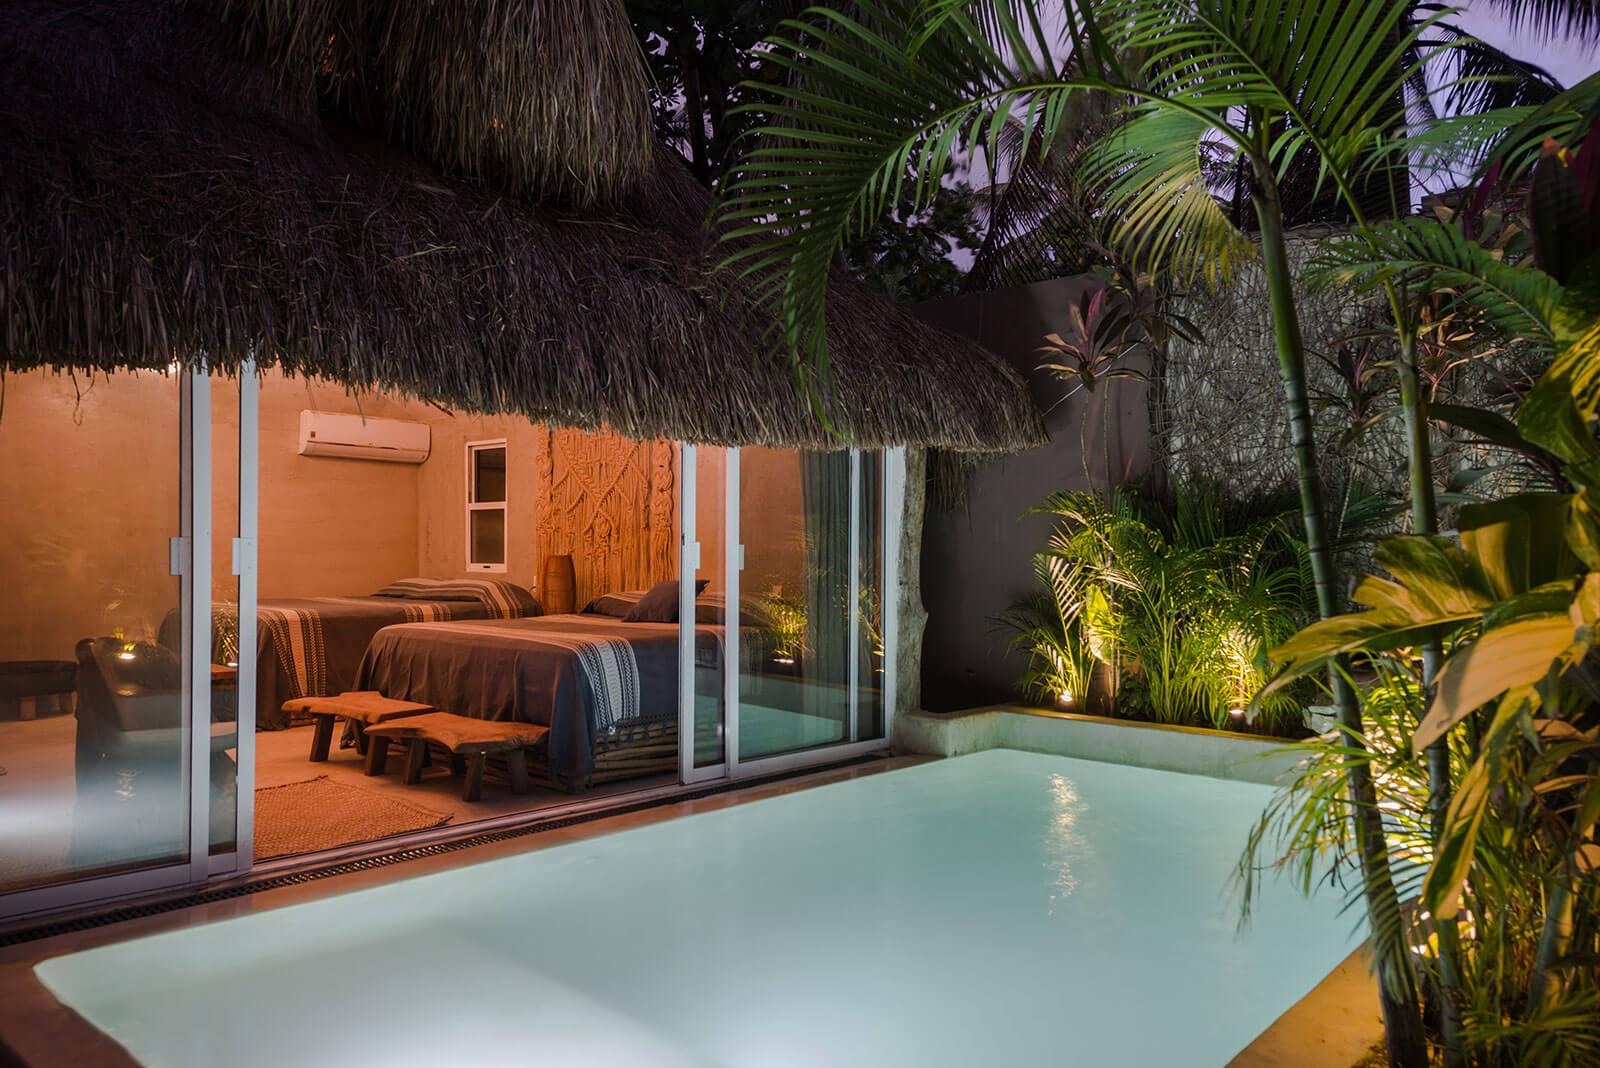 Maya_Luxe_Riviera_Maya_Luxury_Vacations_Villa_Rentals_Tulum_Playa_del_Carmen_Mexico_Bejuco_House_4.jpg